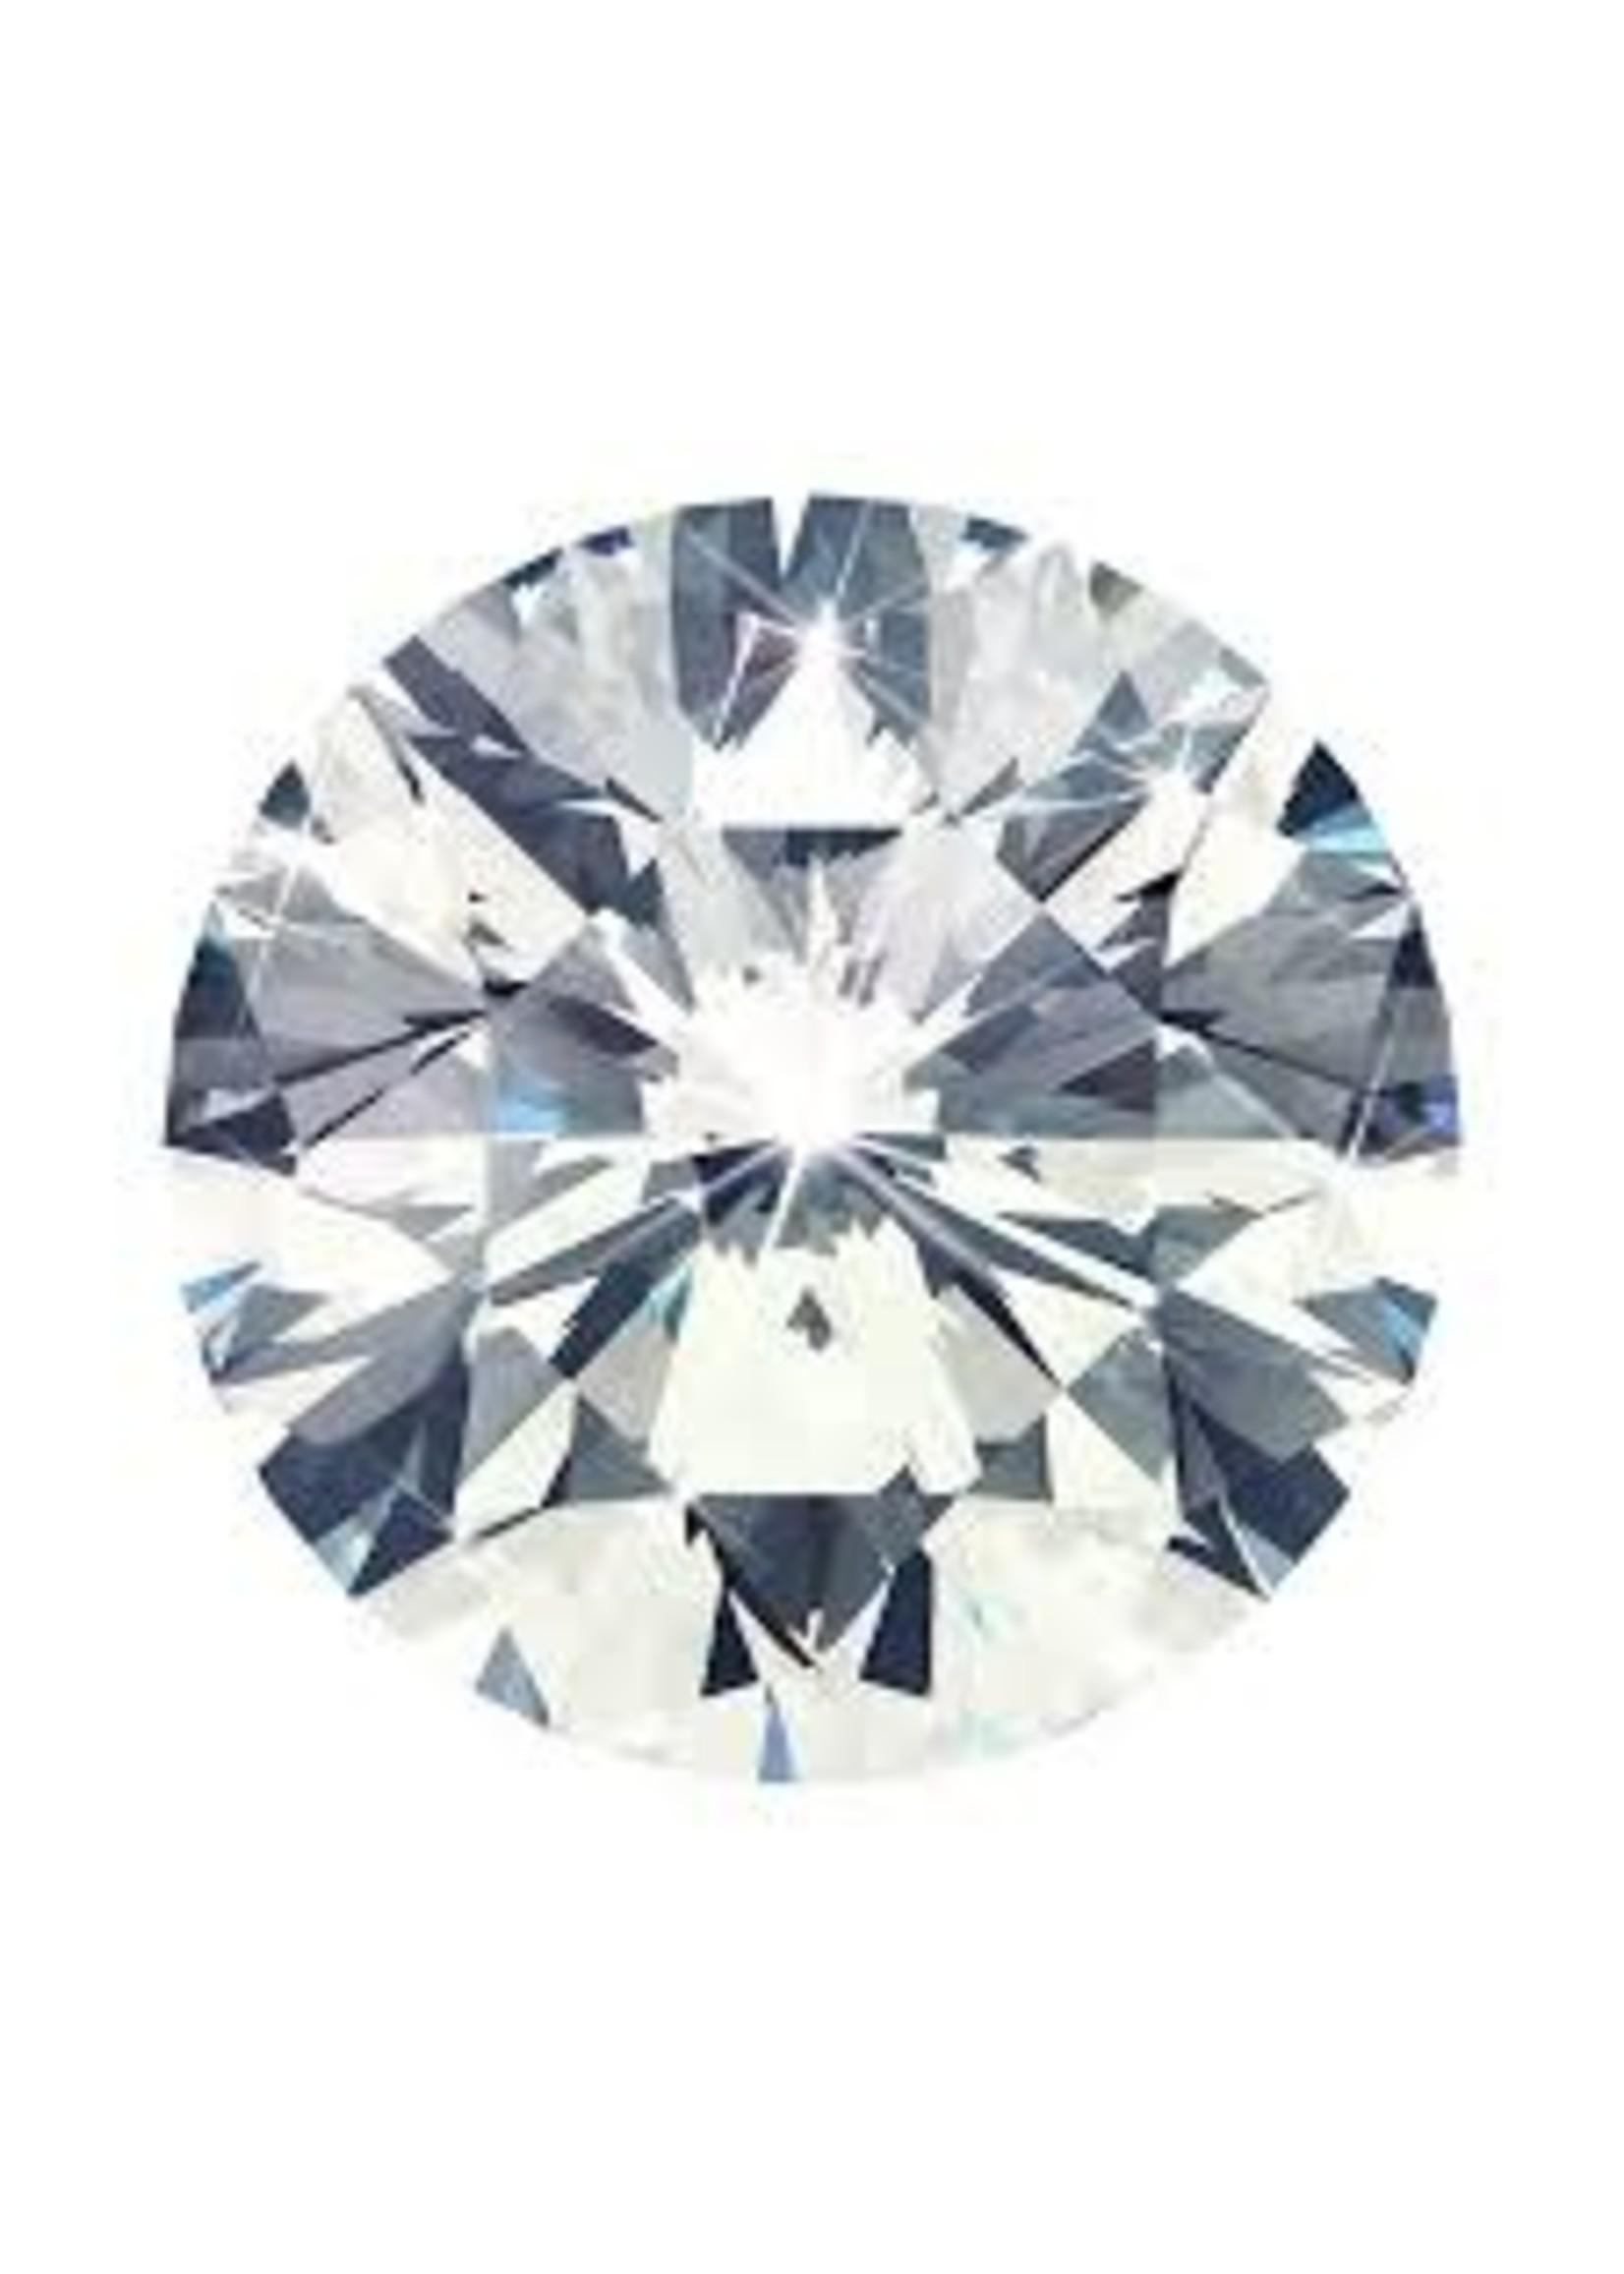 1.02CT ROUND BRILLIANT CUT DIAMOND (SI-2/D/VERY GOOD)